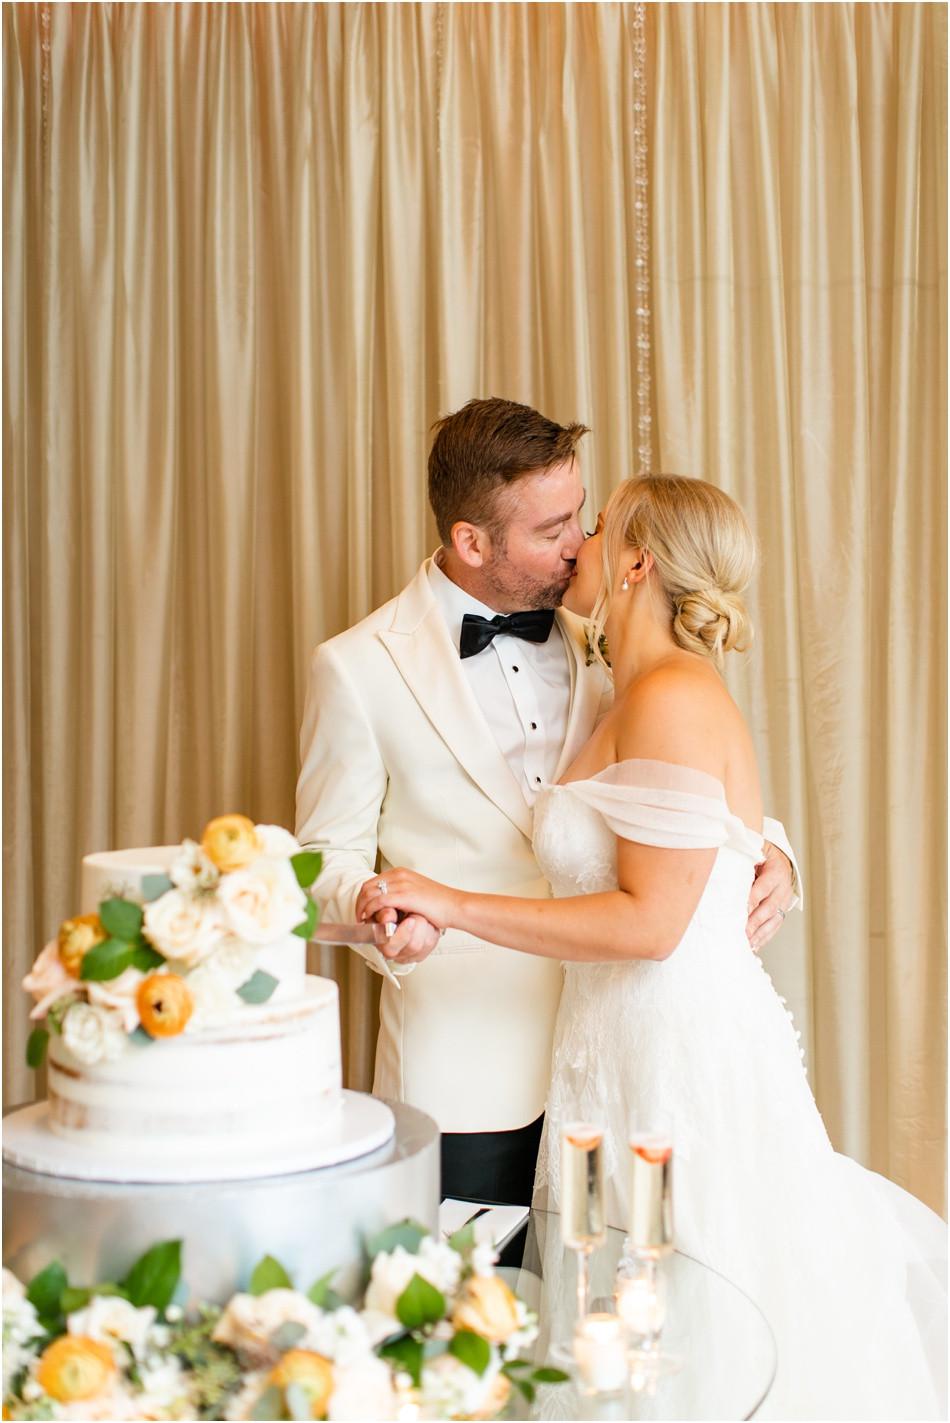 Cake-cutting-new-orleans-wedding